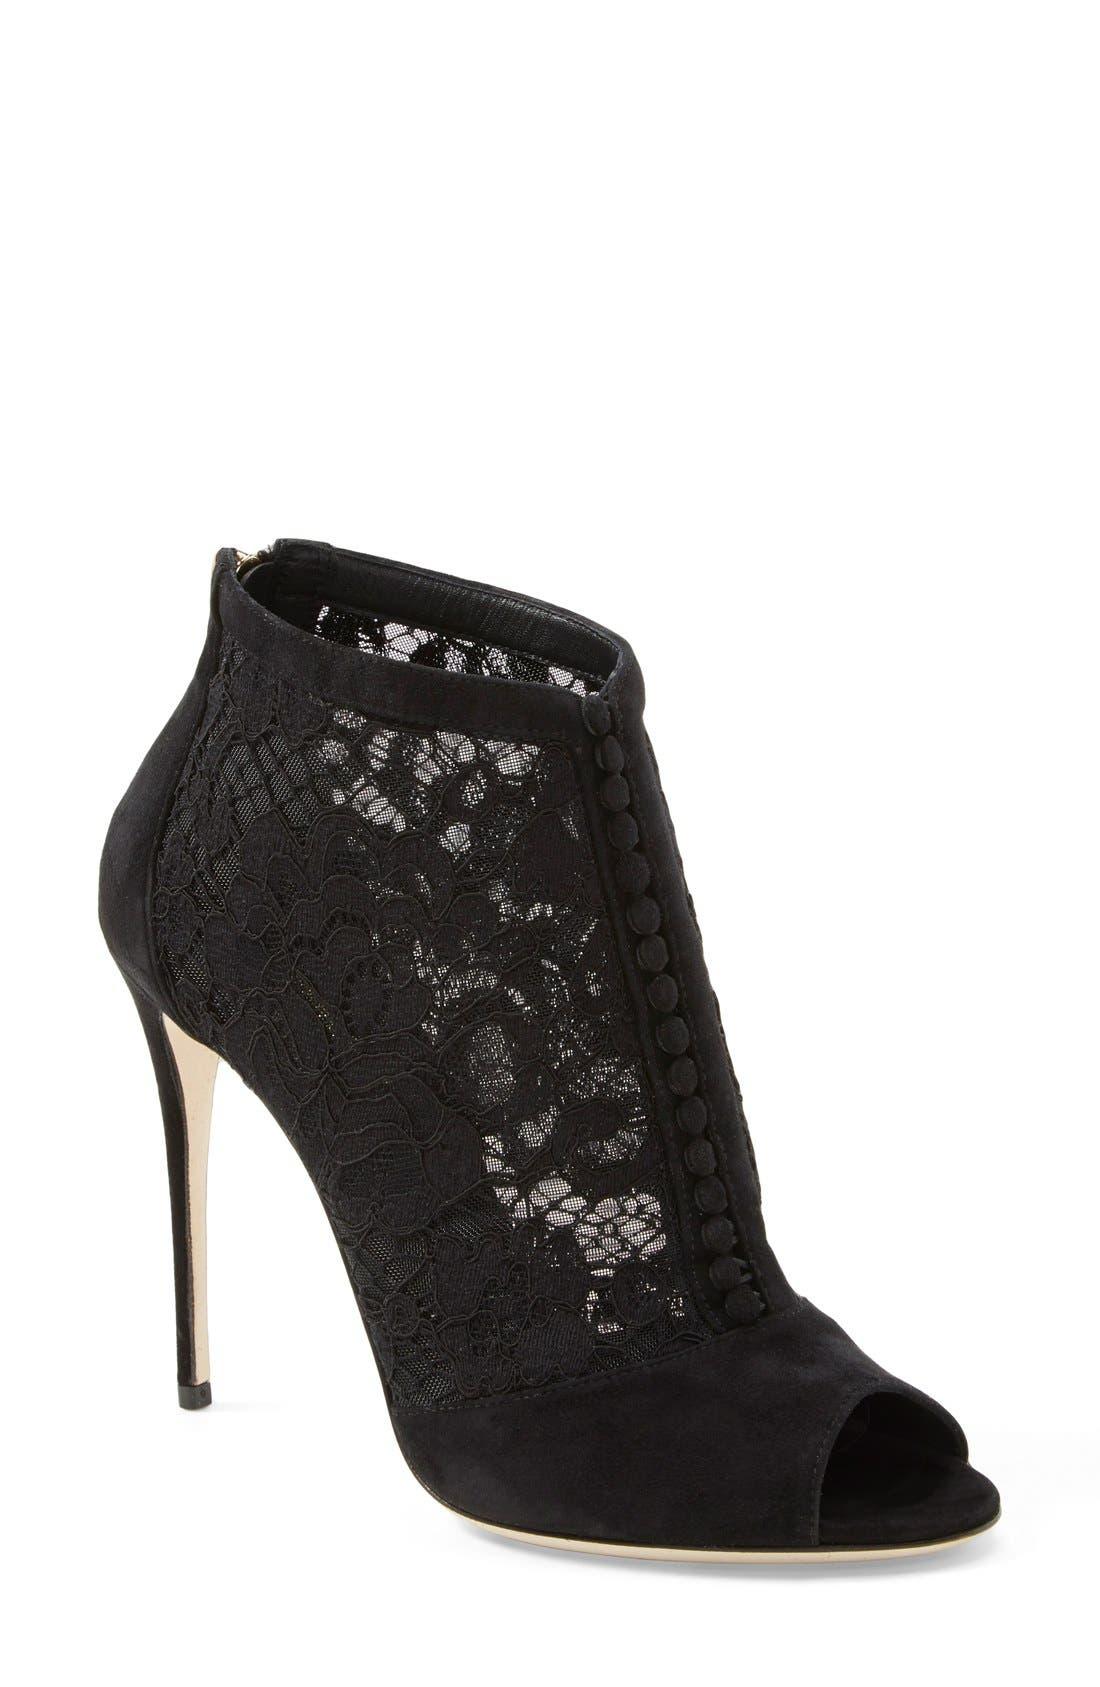 Alternate Image 1 Selected - Dolce&Gabbana Peep Toe Bootie (Women)